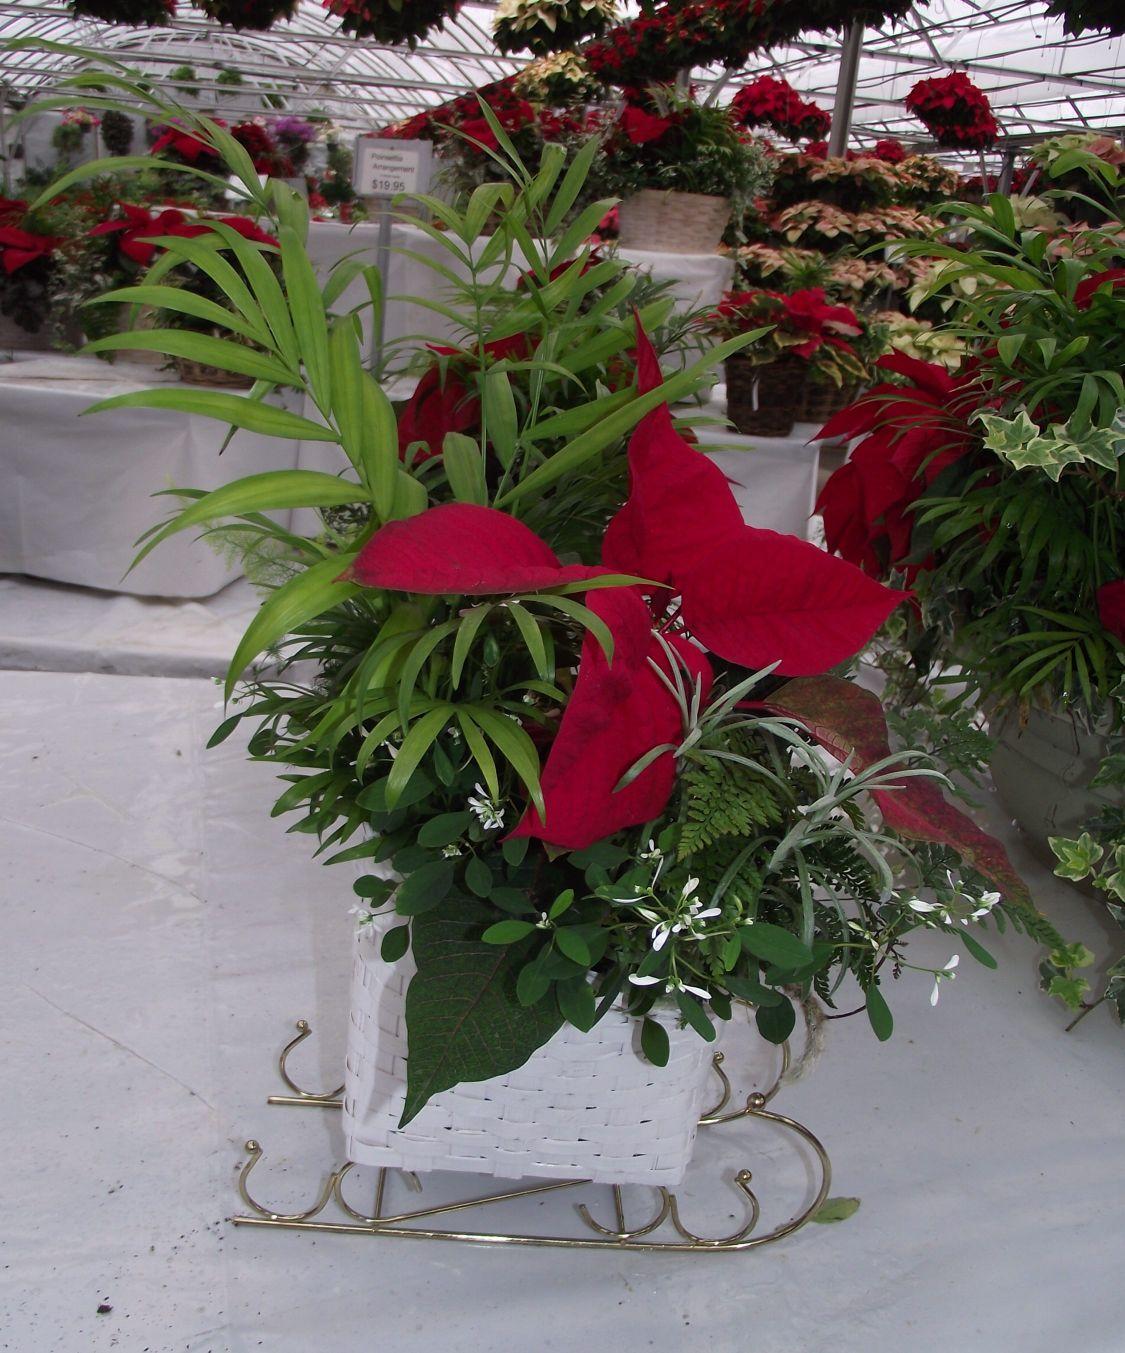 Frysville Farms Has The Christmas Spirit The Heart Of